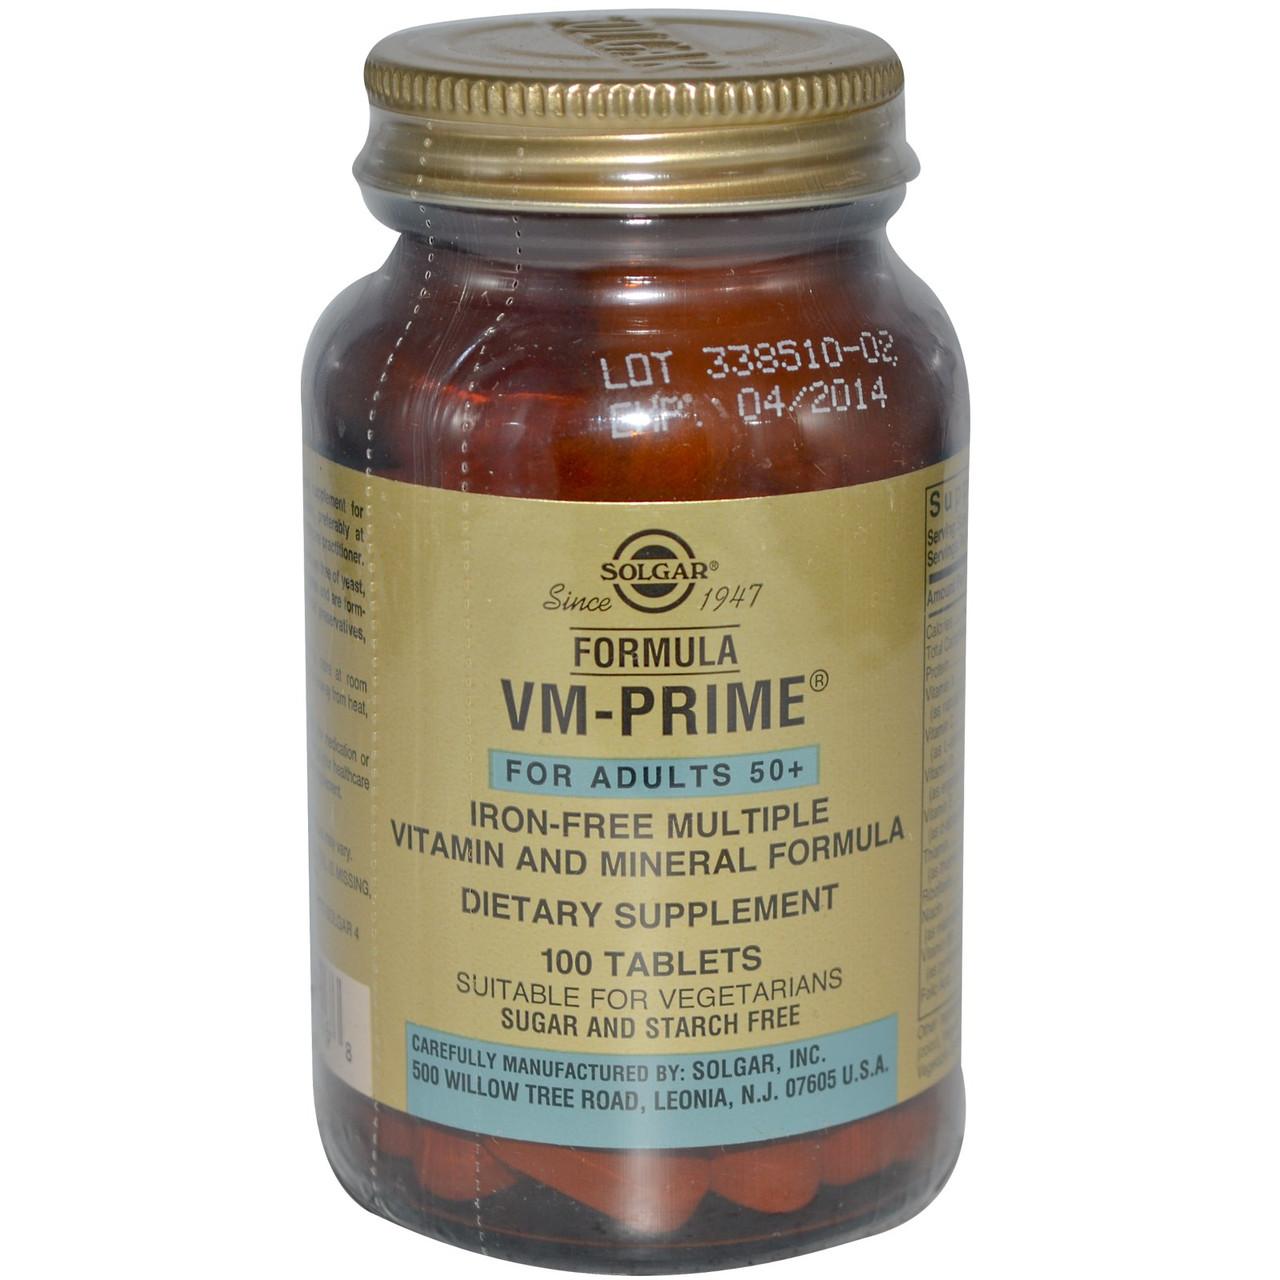 Комплексные витамины Solgar, Формула VM-Prime, старше 50 лет, 100 таблеток